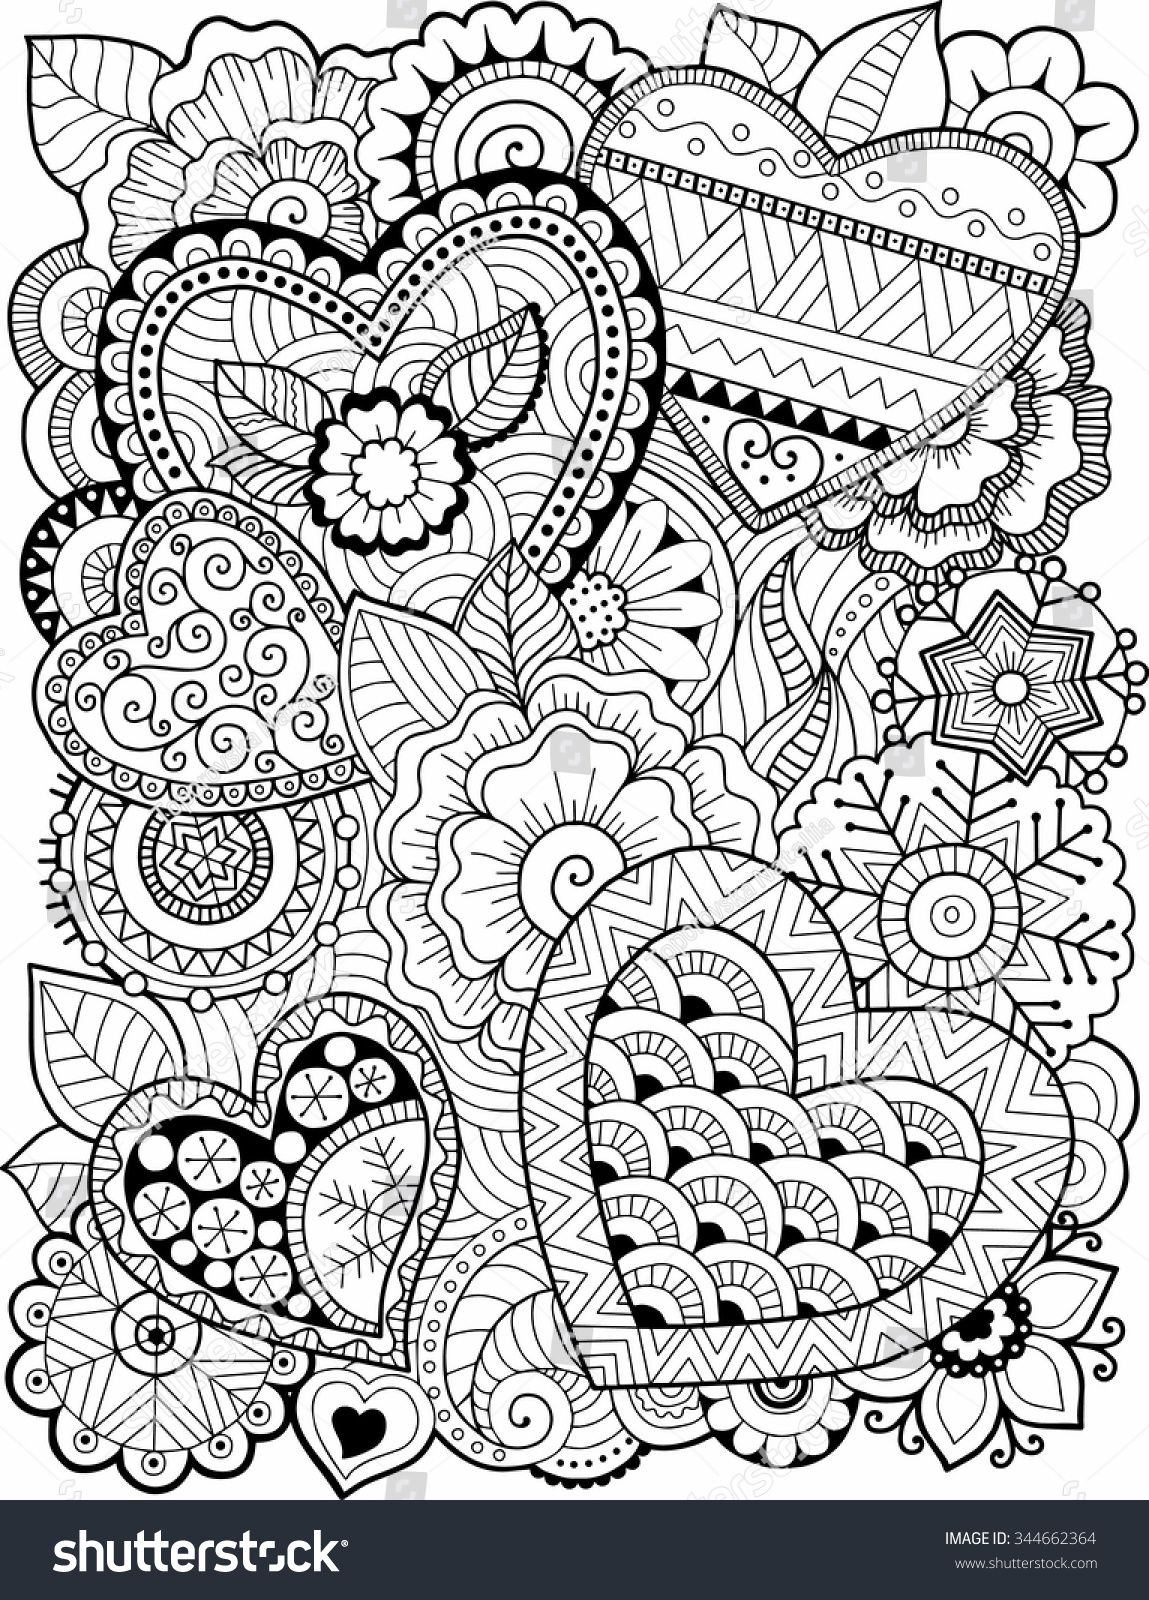 Vector Coloring Book For Adult Hearts And Flowers Raskraski Abstraktnye Raskraski Besplatnye Raskraski